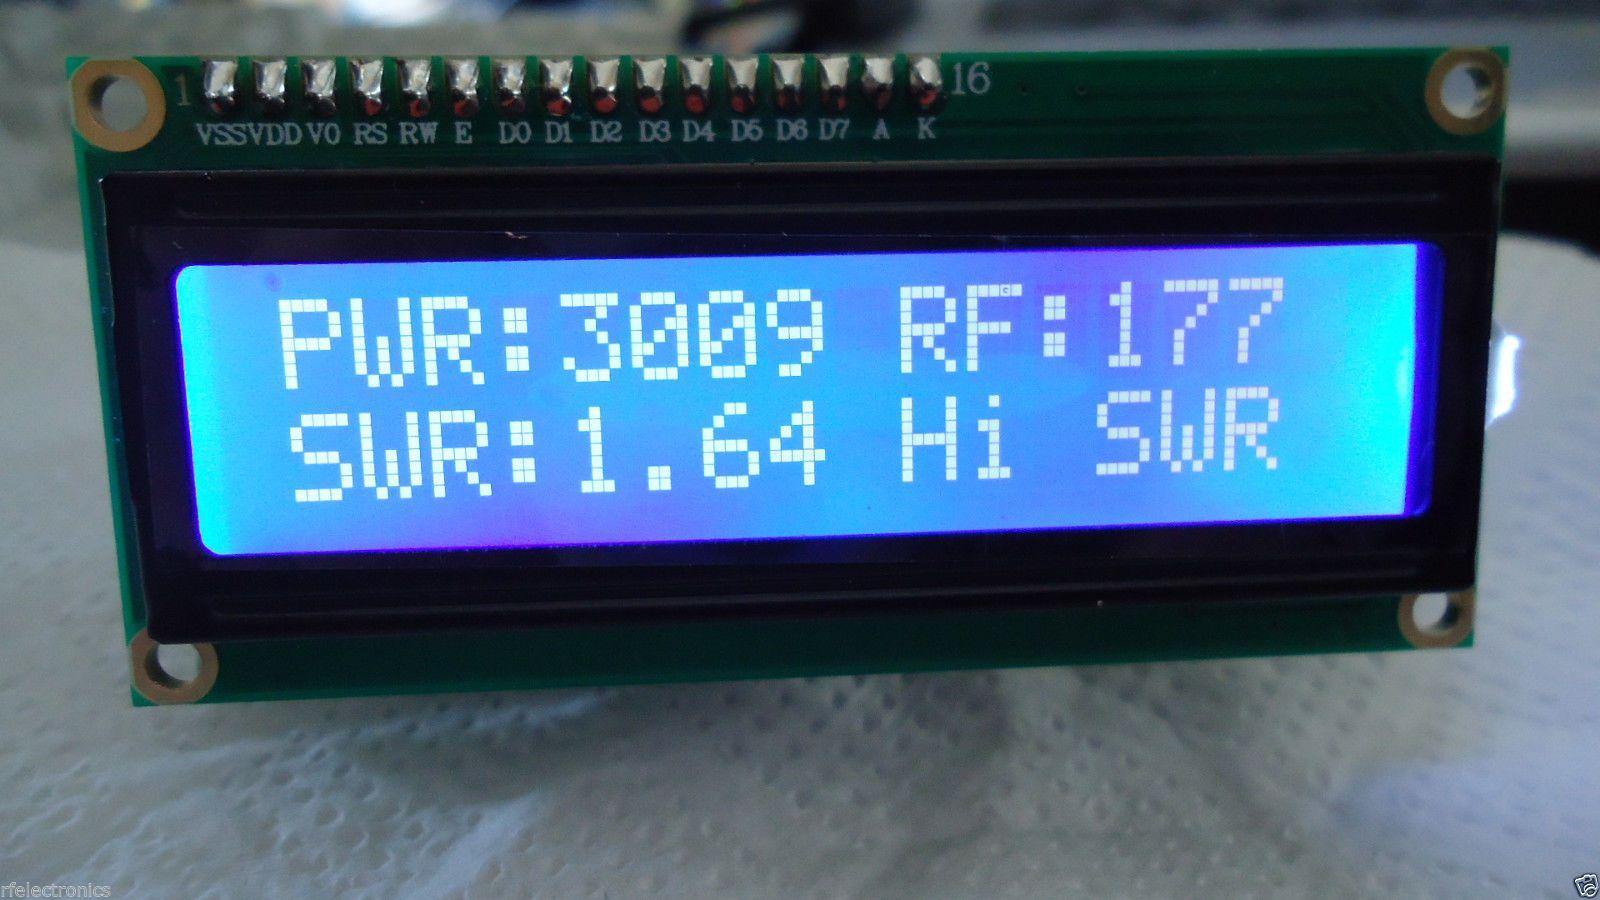 Swr Meter Technology T Electronic Schematics Diy Wideband Test Amplifier Circuit Diagram Tradeoficcom 3kw Power Bridge Digital Lcd 2x16 Blue Indicator Protection Ebay